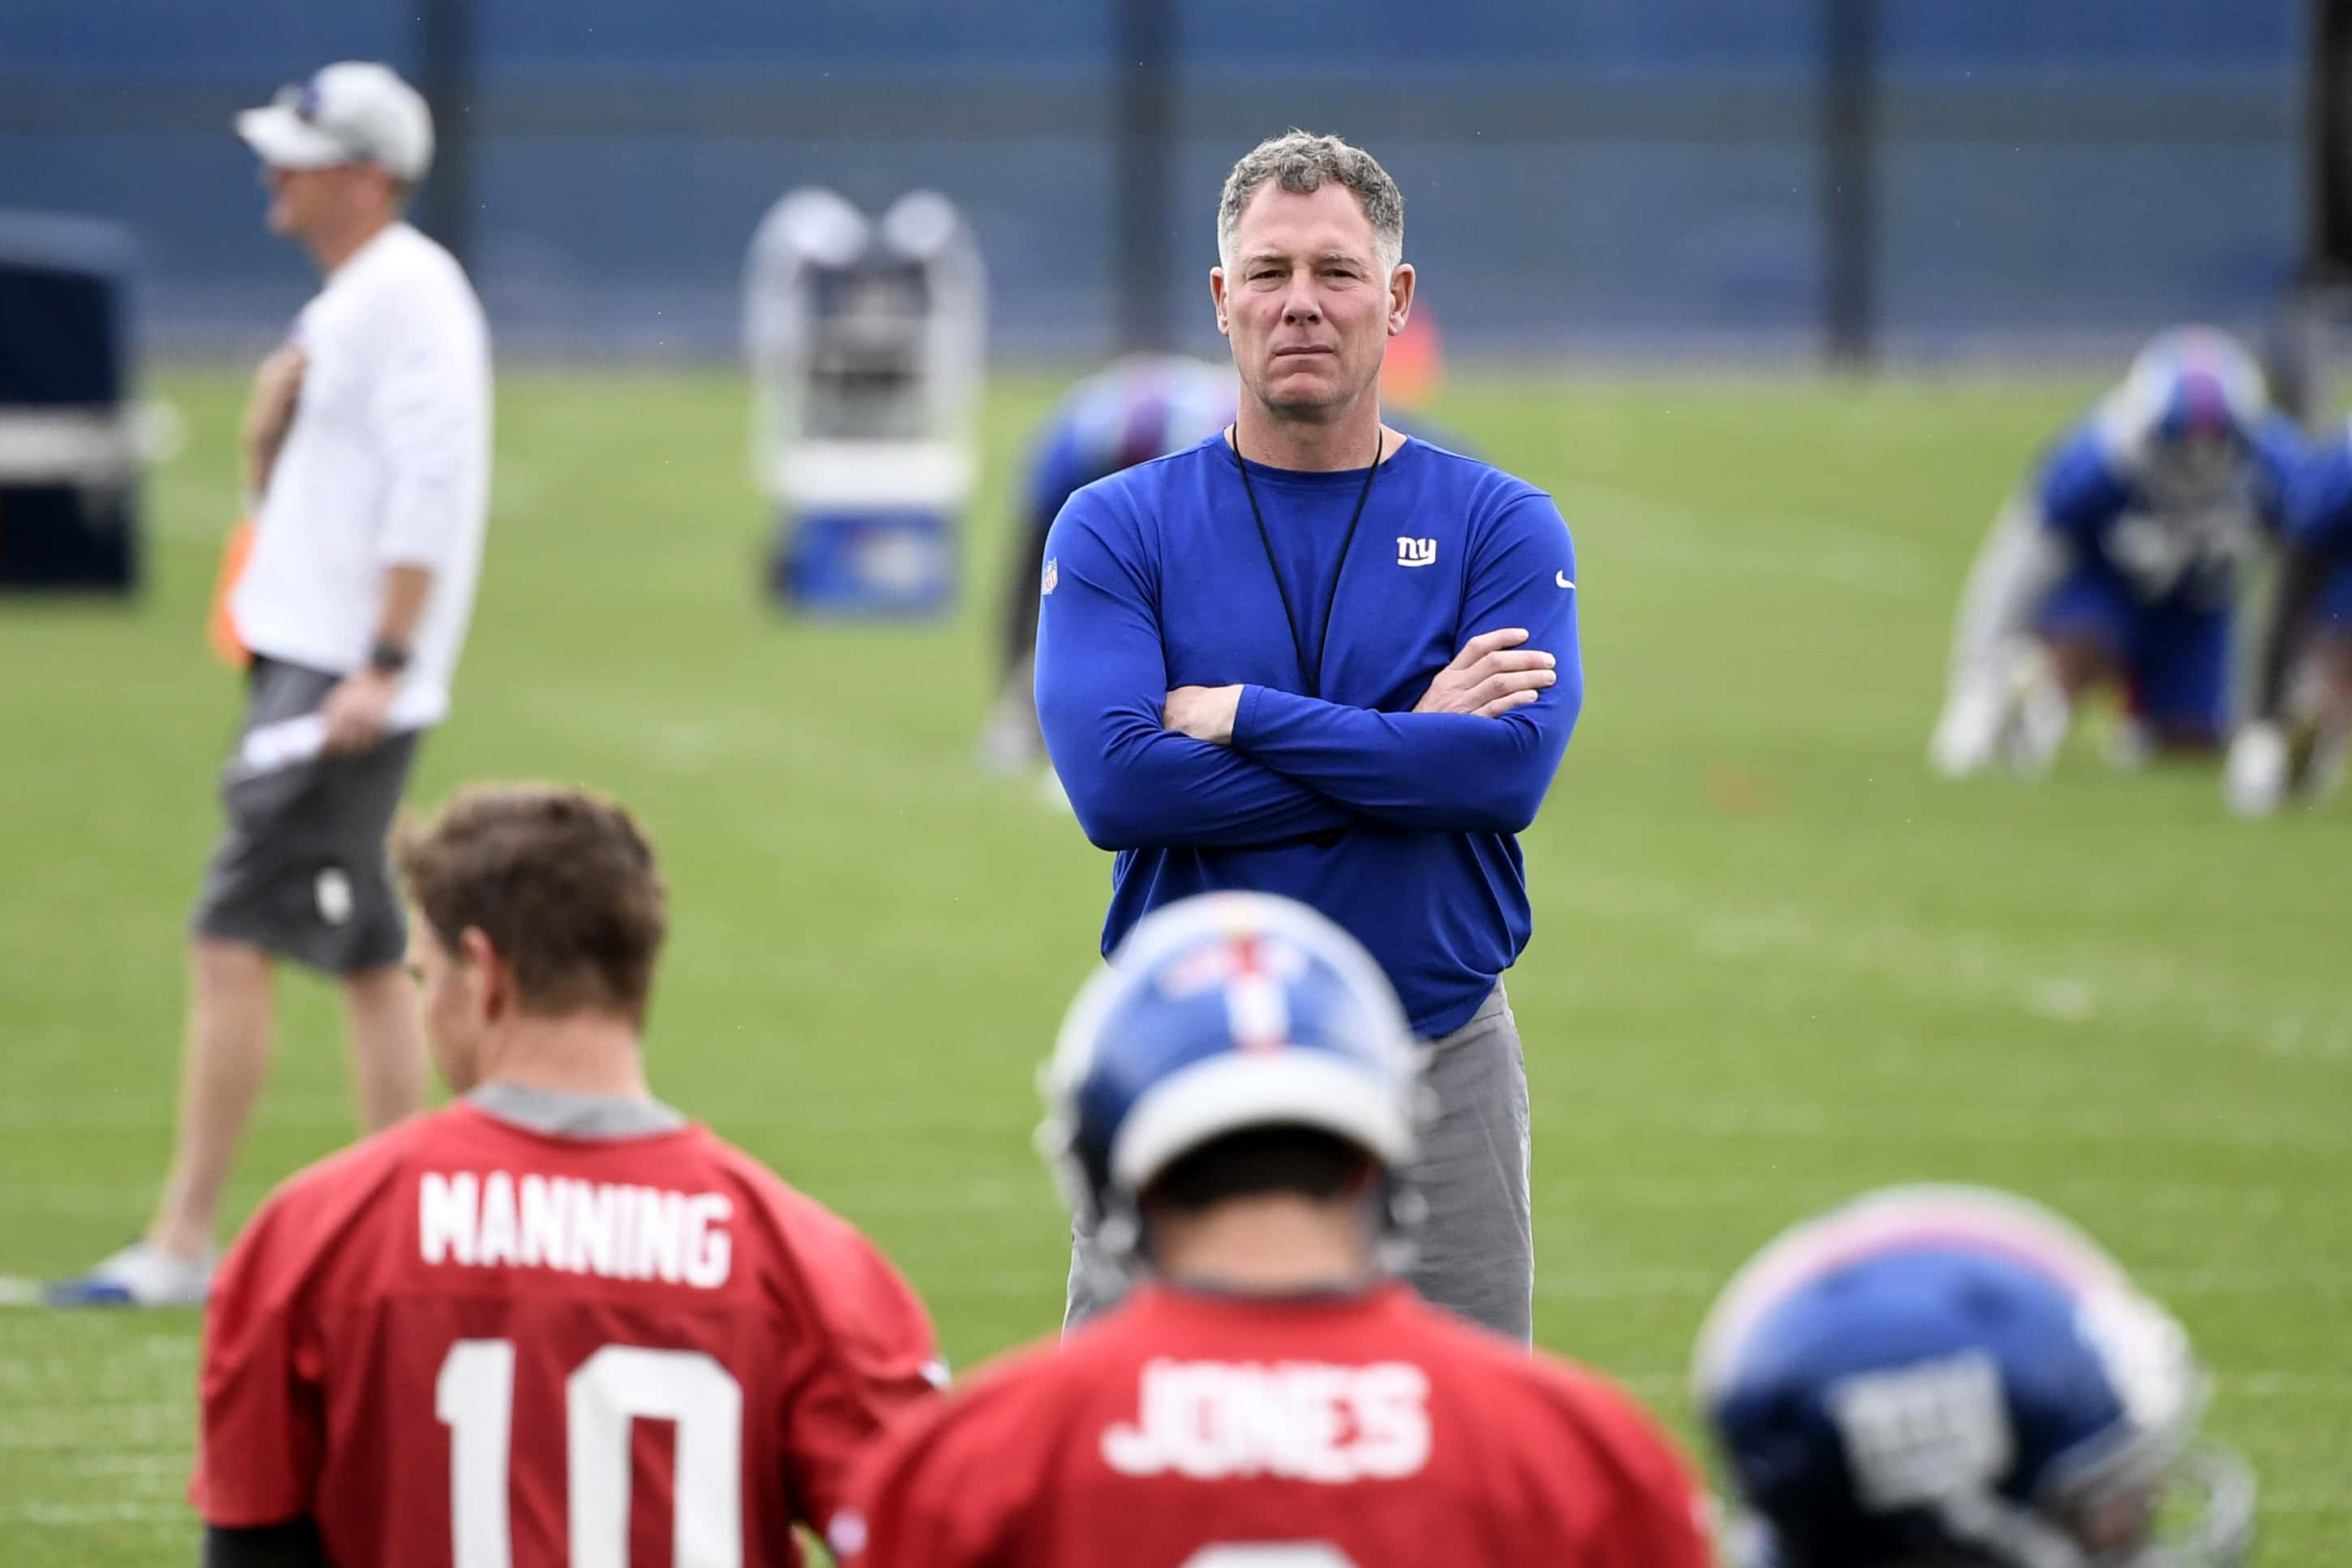 Icumi Listen To Giants Head Coach Pat Shurmur Discuss The